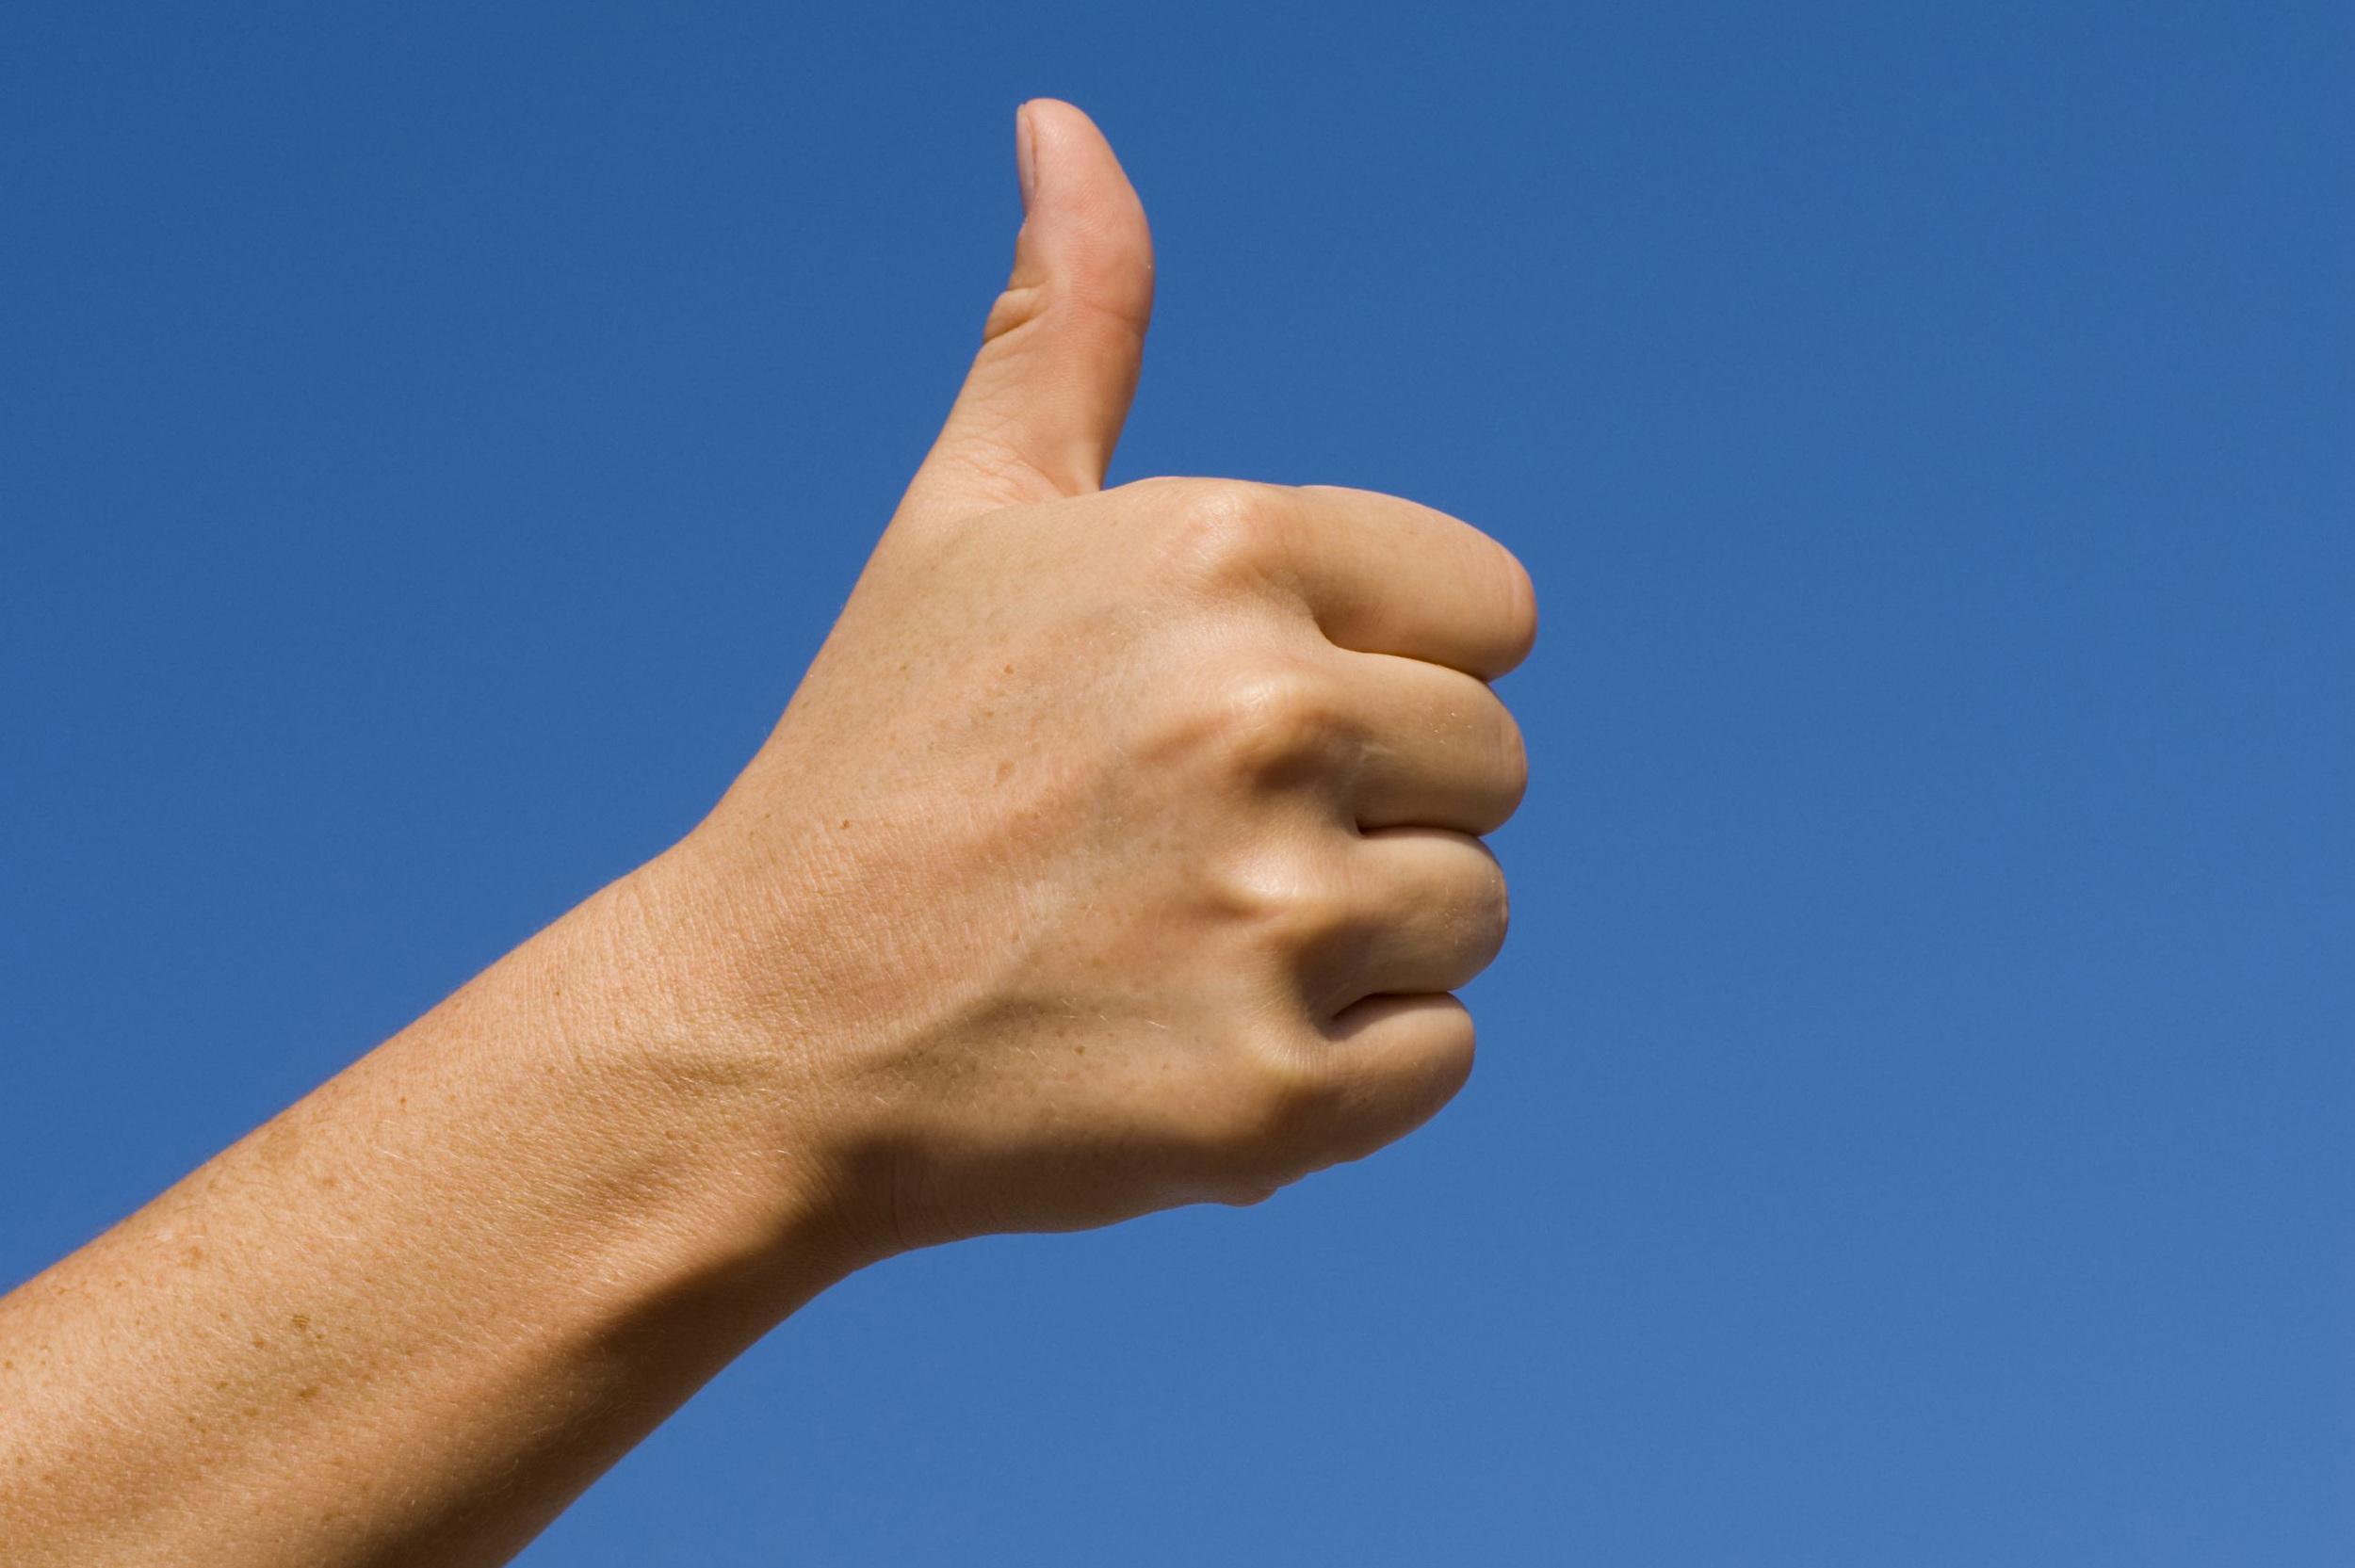 hand-gestures-1.jpg